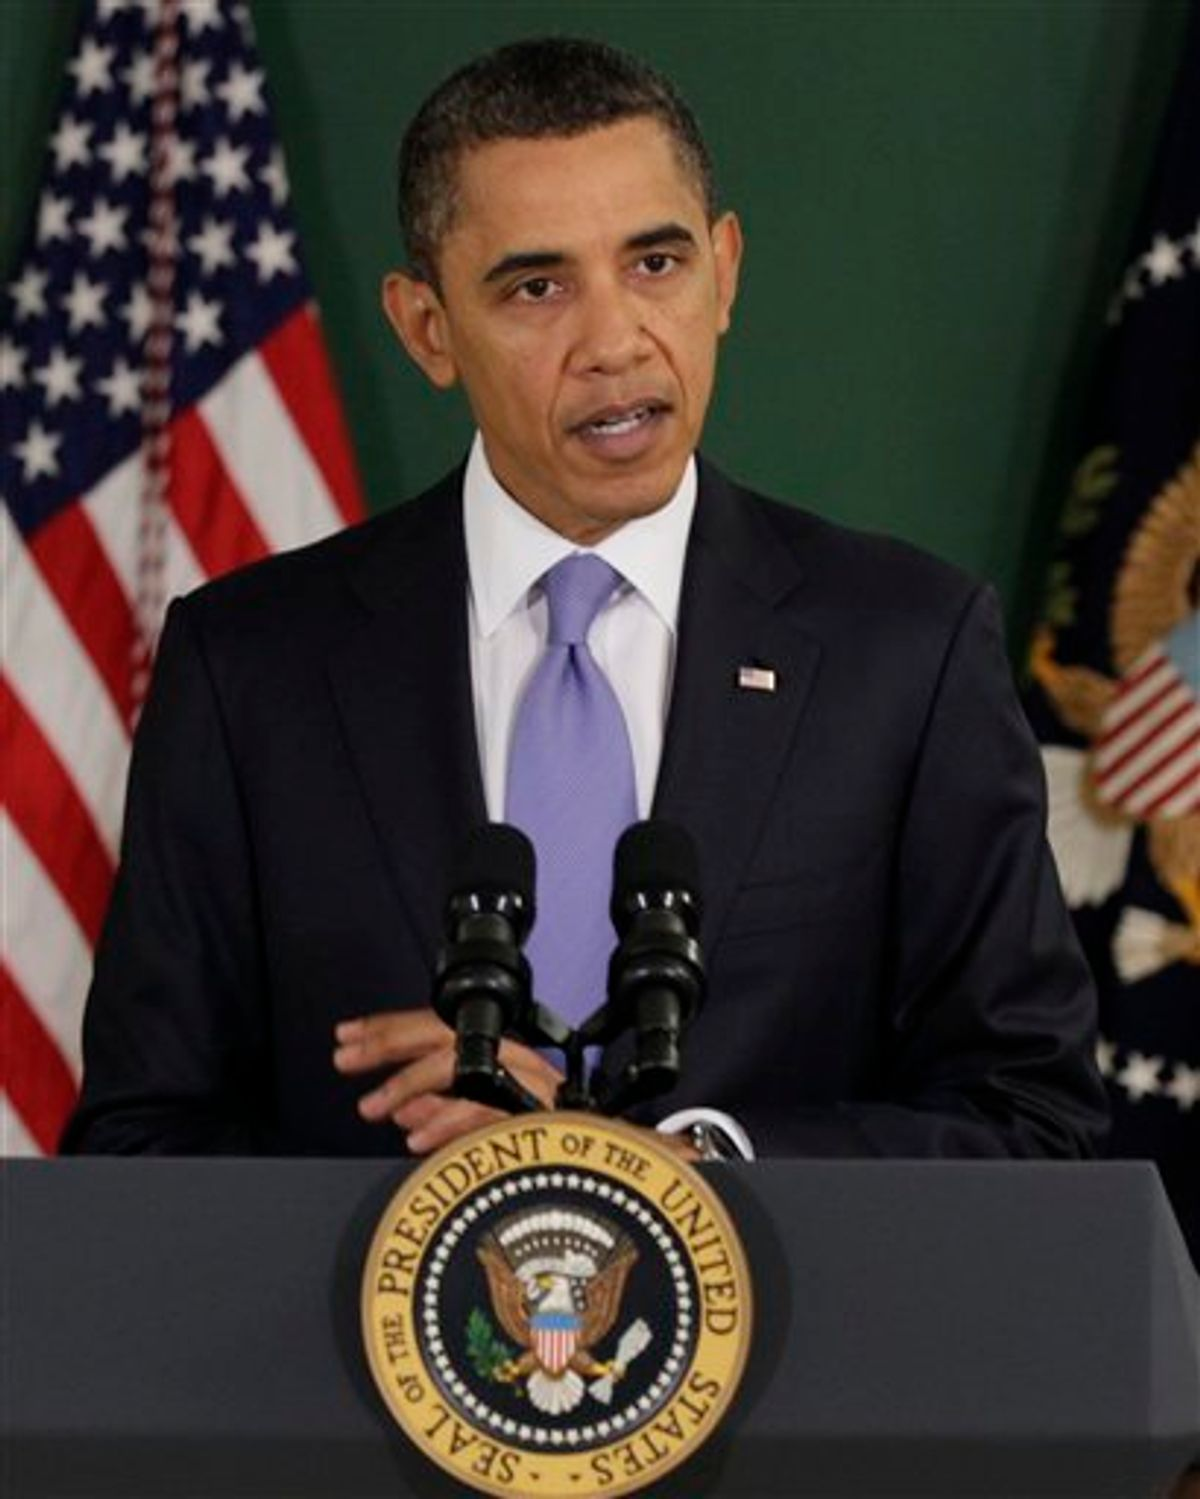 President Barack Obama speaks at Parkville Middle School and Center of Technology, in Parkville, Md., Monday, Feb., 14, 2011. (AP Photo/Carolyn Kaster) (AP)